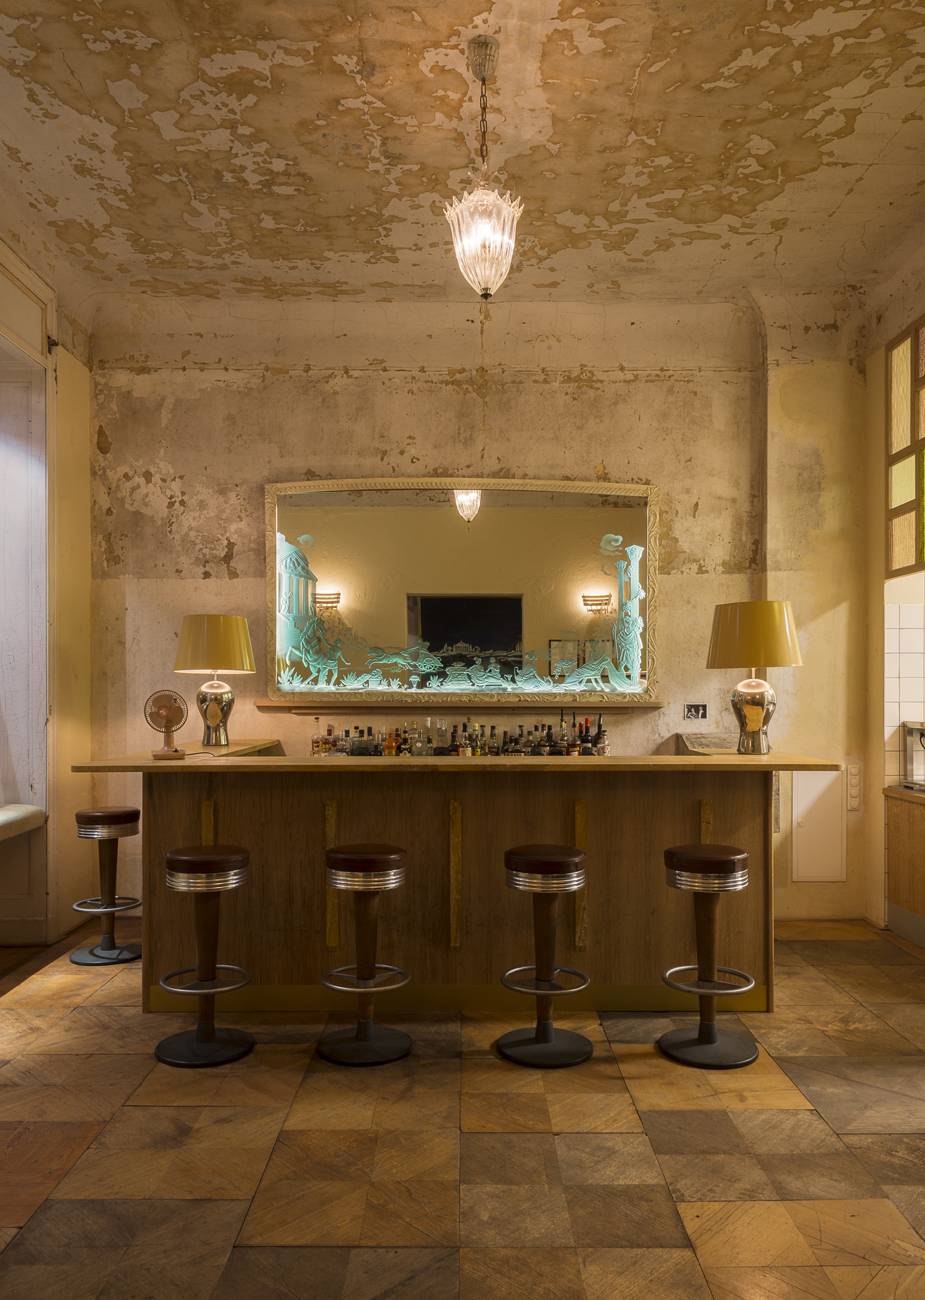 Dottir_Restaurant_4